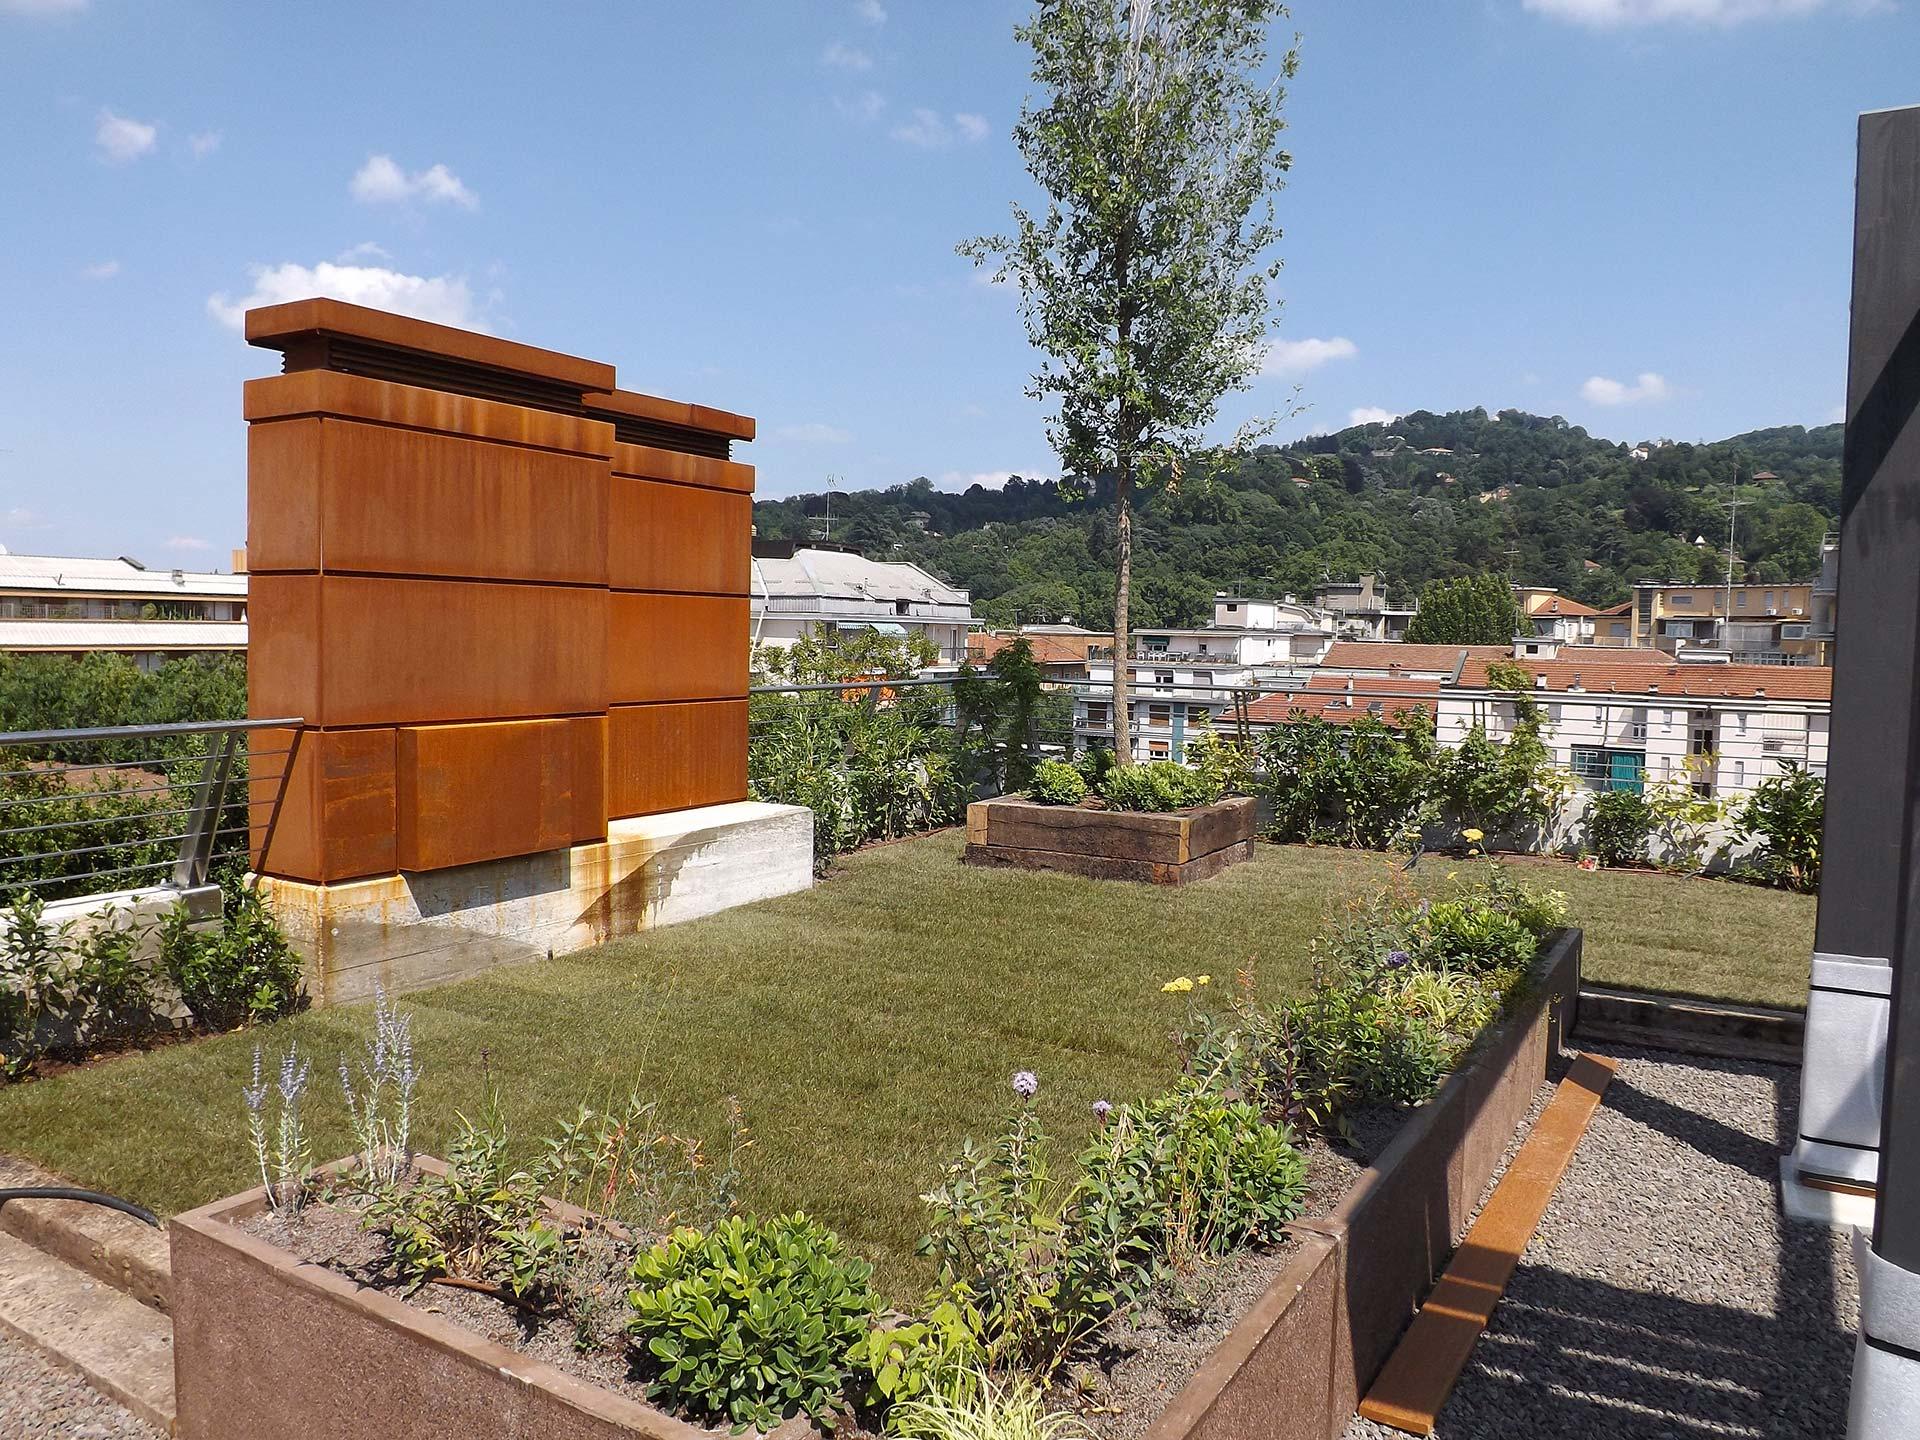 Best Impianti Irrigazione Terrazzo Images - Idee Arredamento Casa ...